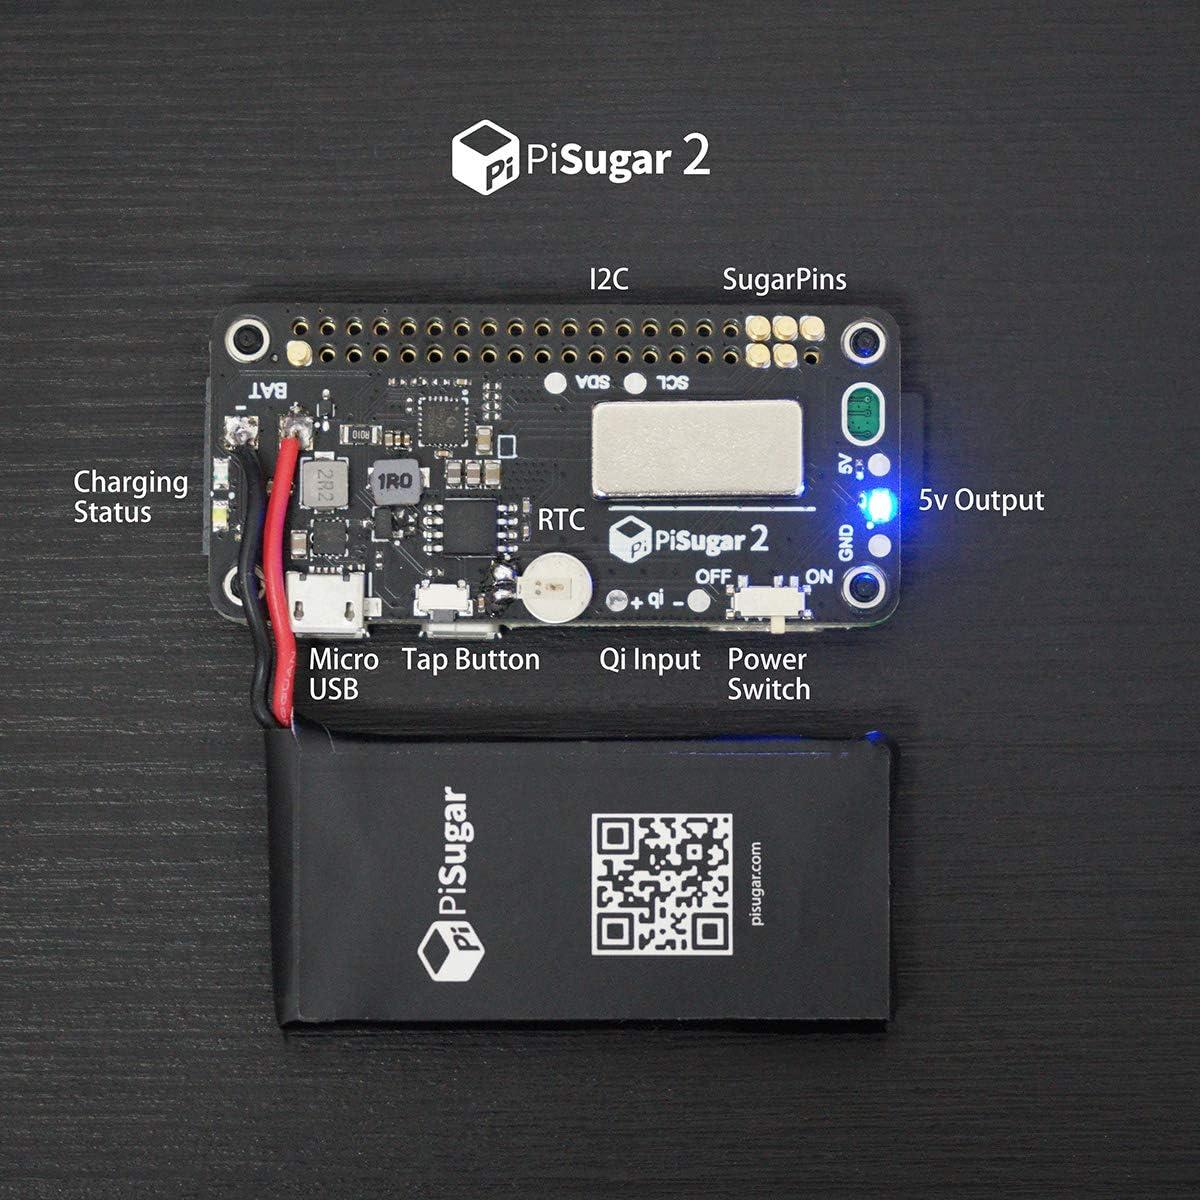 Not Include Raspberry Pi Pisugar2 Portable 1200 mAh UPS Lithium ...